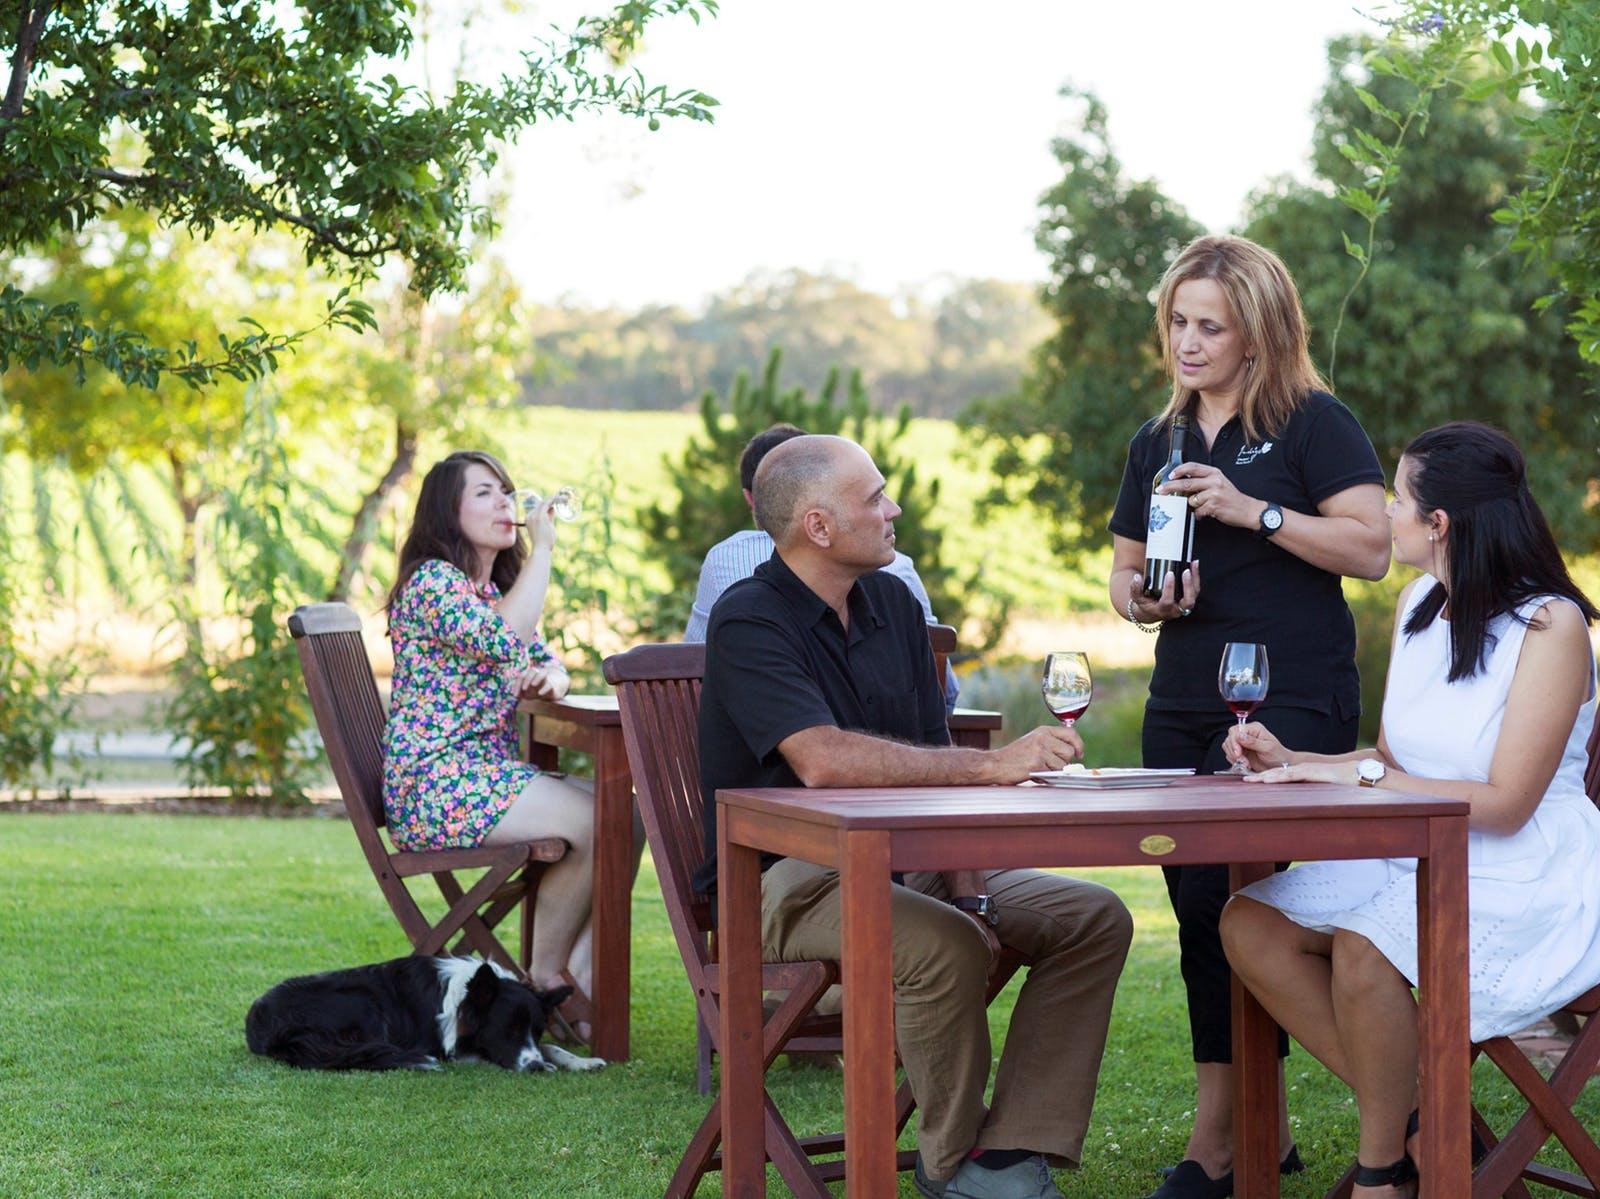 wine tasting on lawn